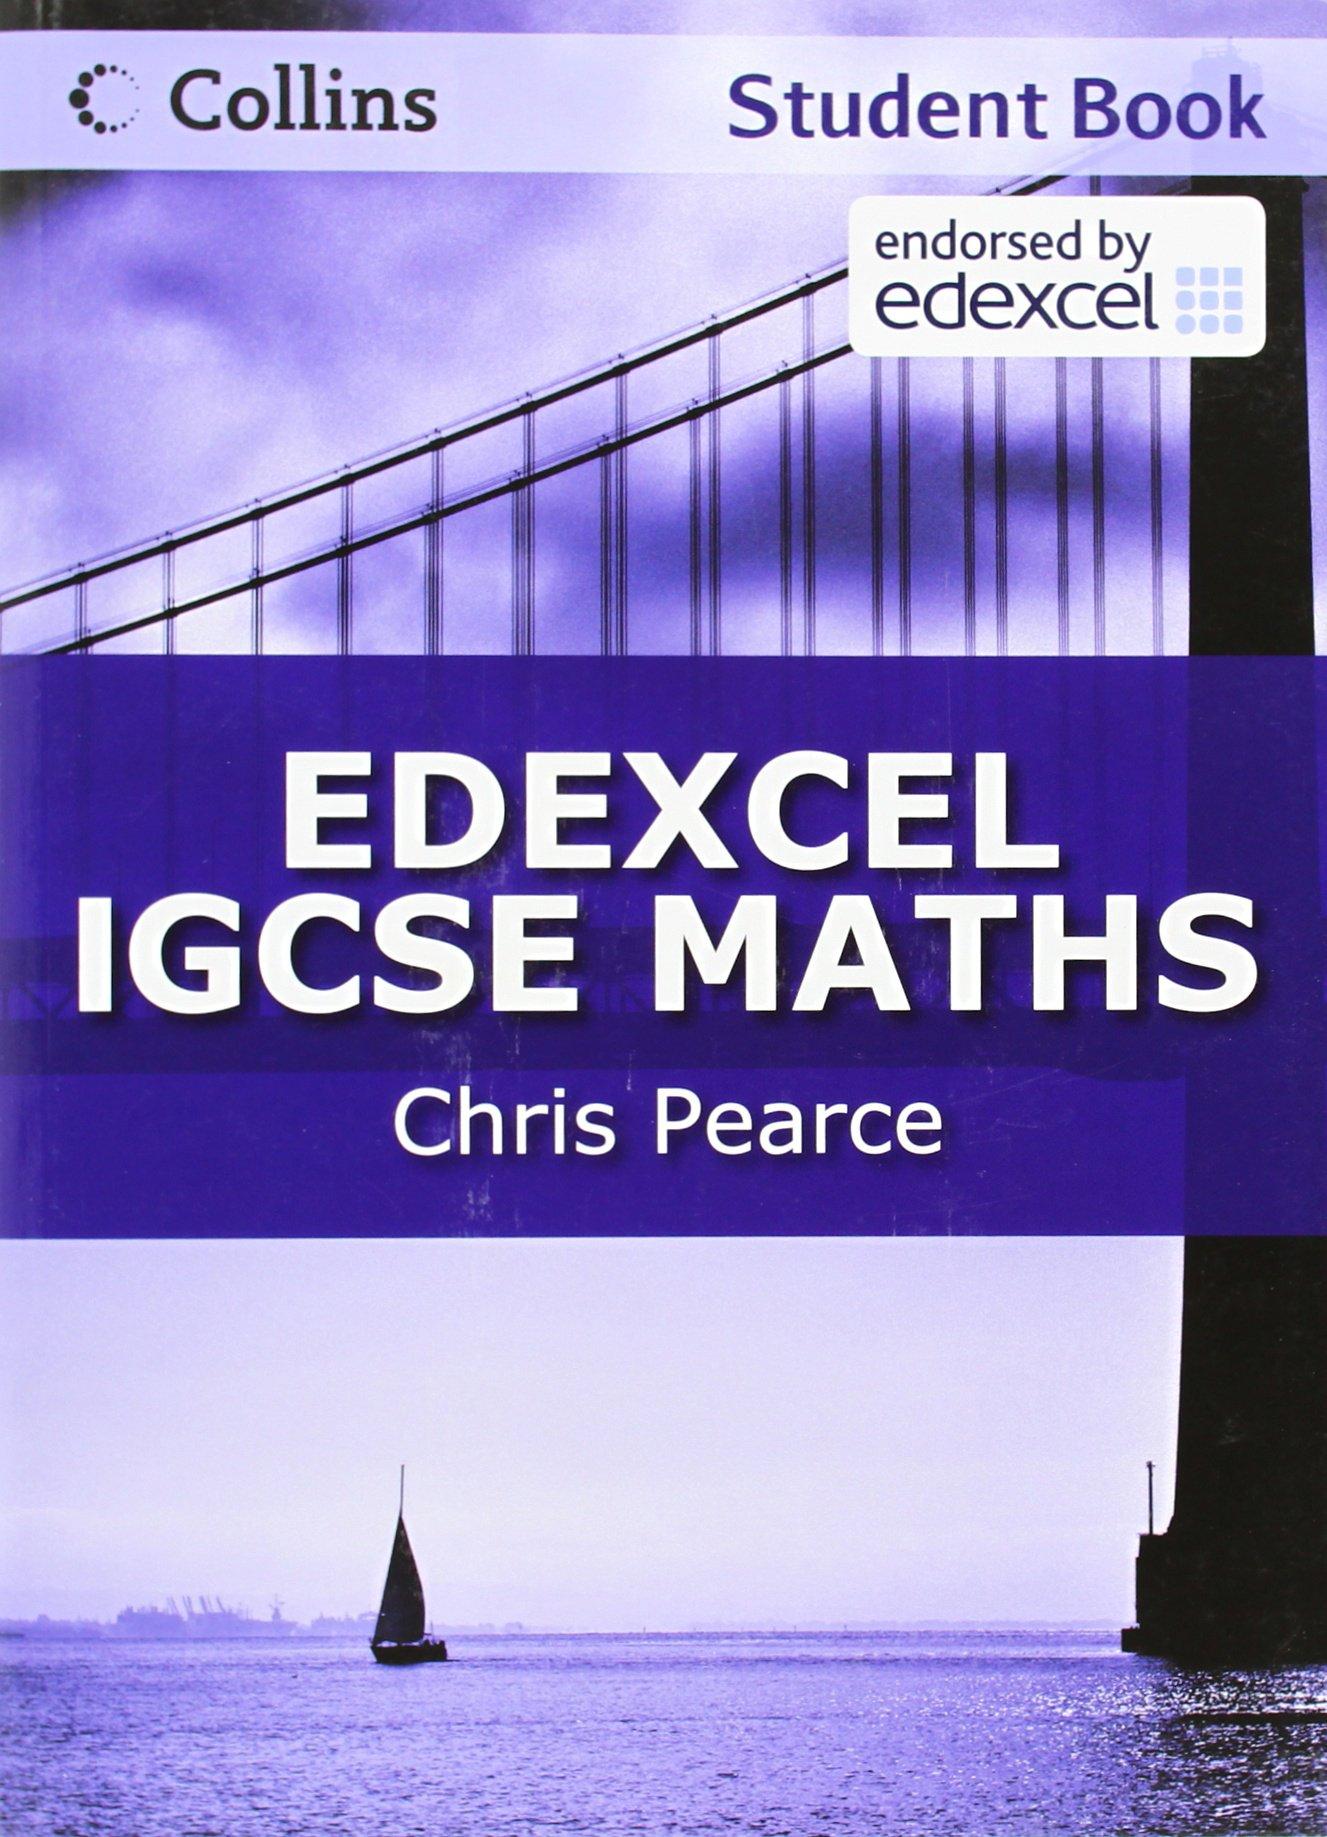 IGCSE Maths Edexcel Student Book (Collins IGCSE Maths): Chris Pearce ...